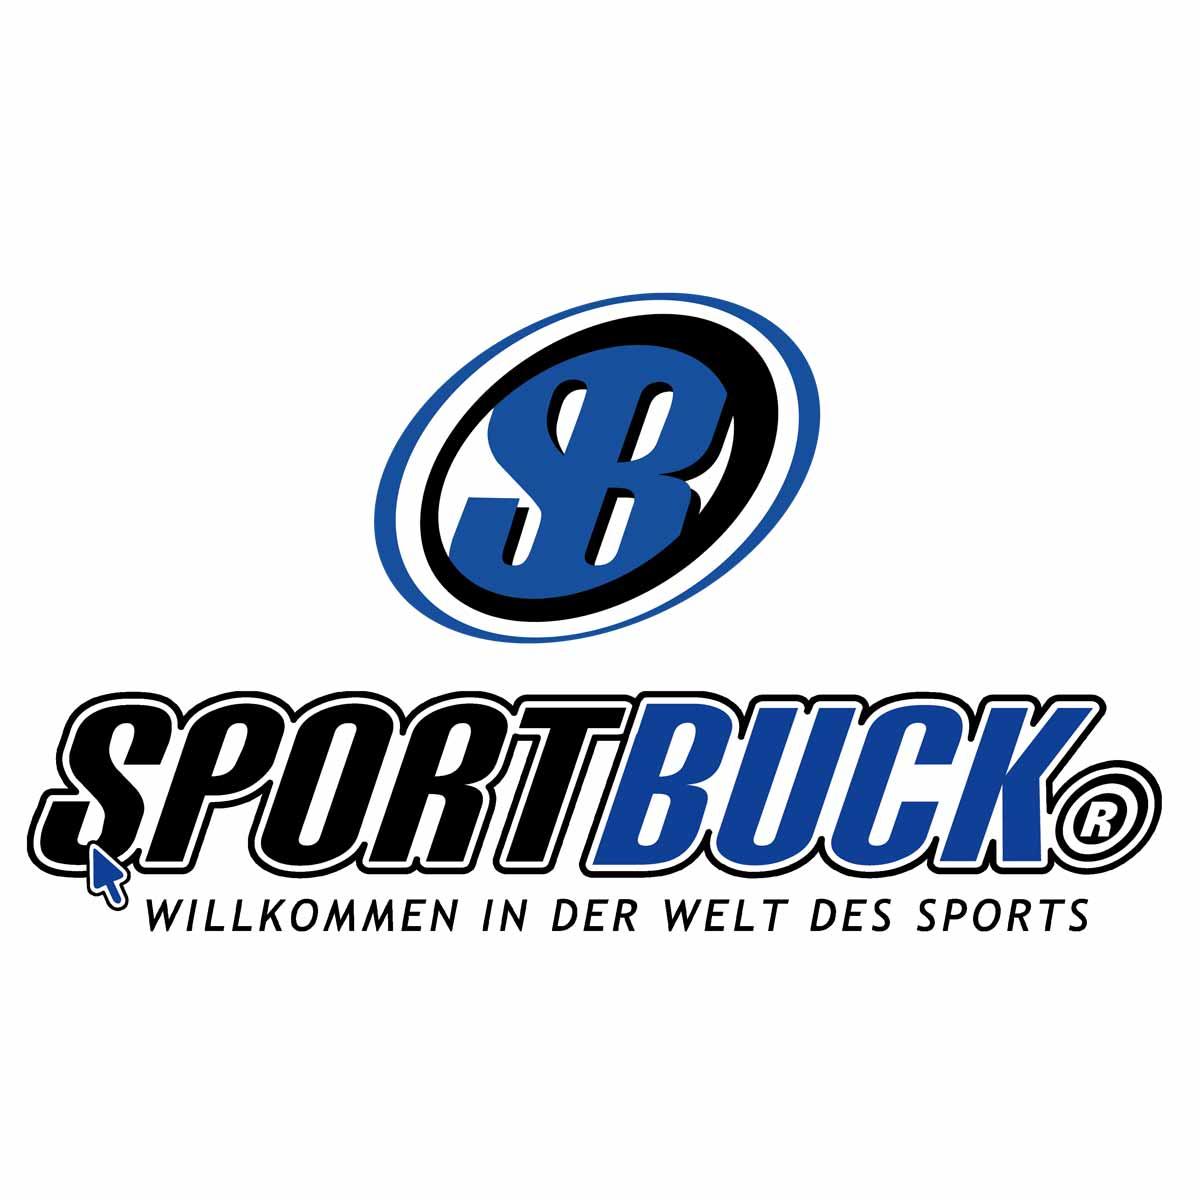 Tanita MC-780MA Segment-Körperanalyse Multifrequenz ohne GMON Software / inkl. Kabelset